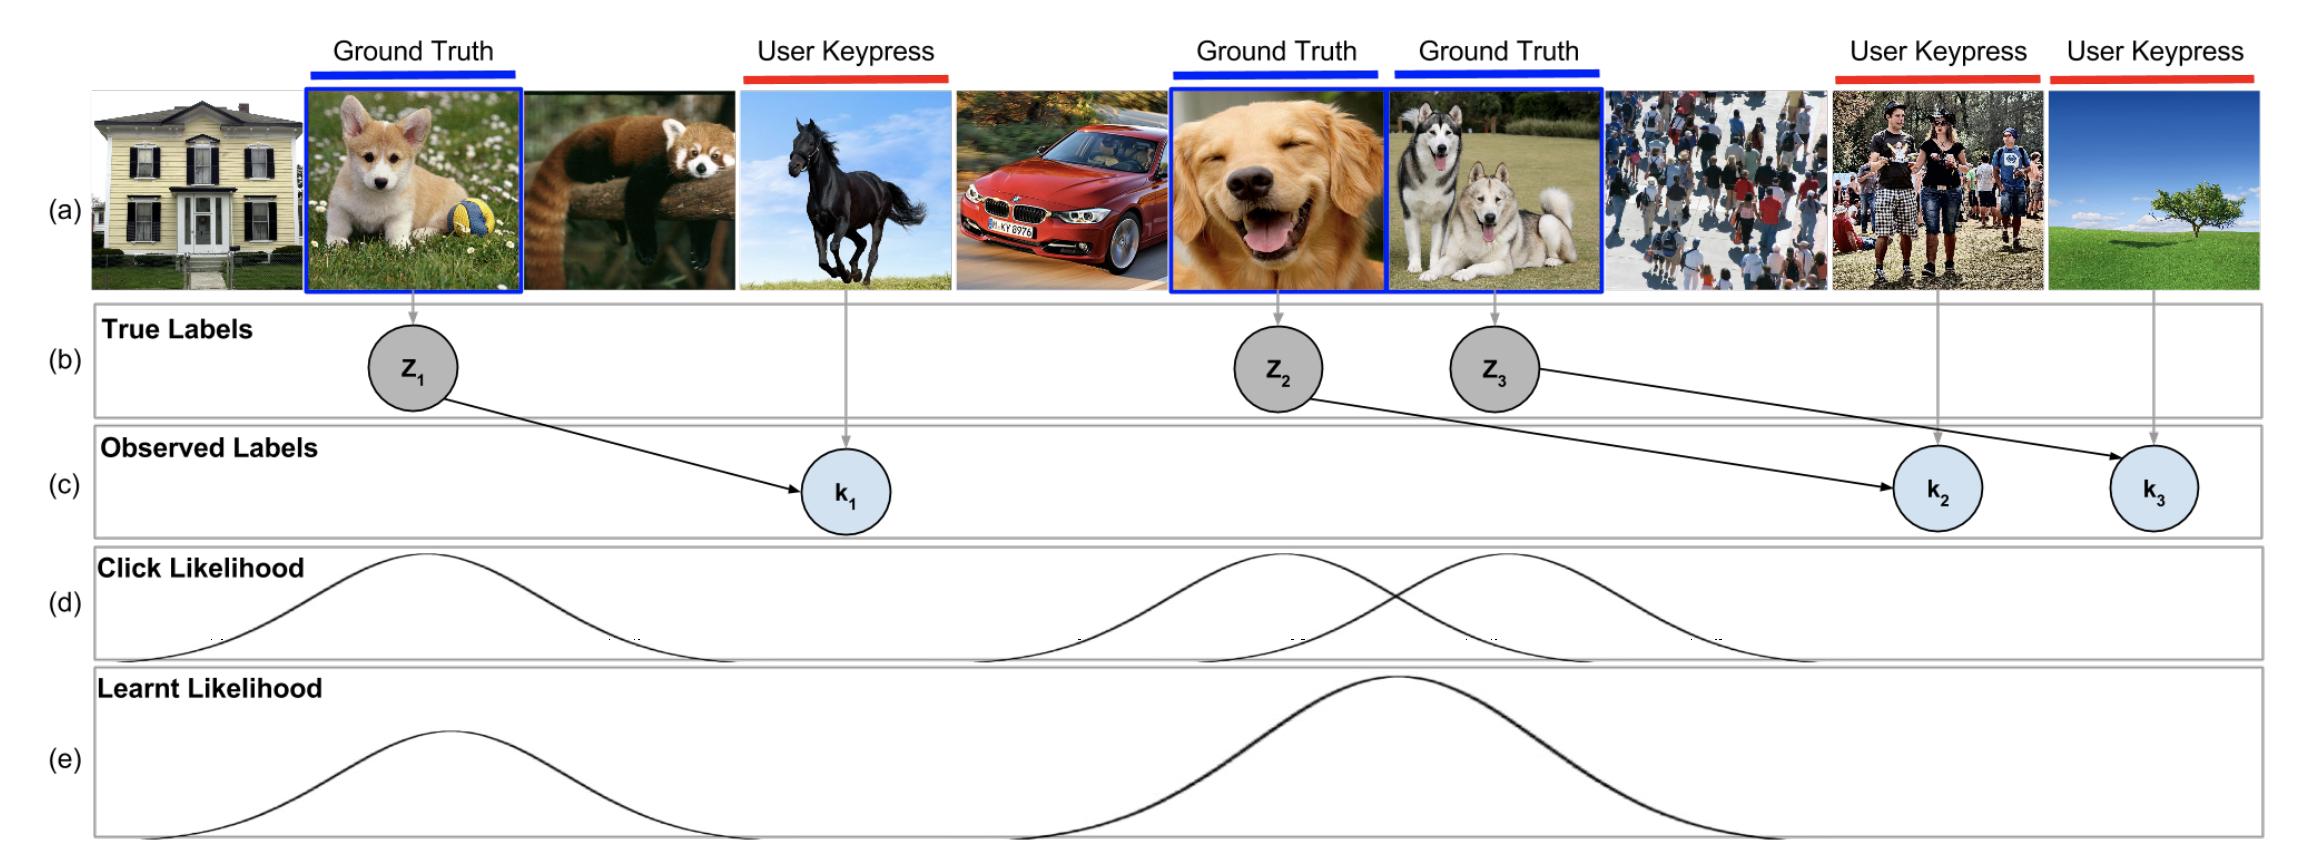 Embracing Error to Enable Rapid Crowdsourcing Image